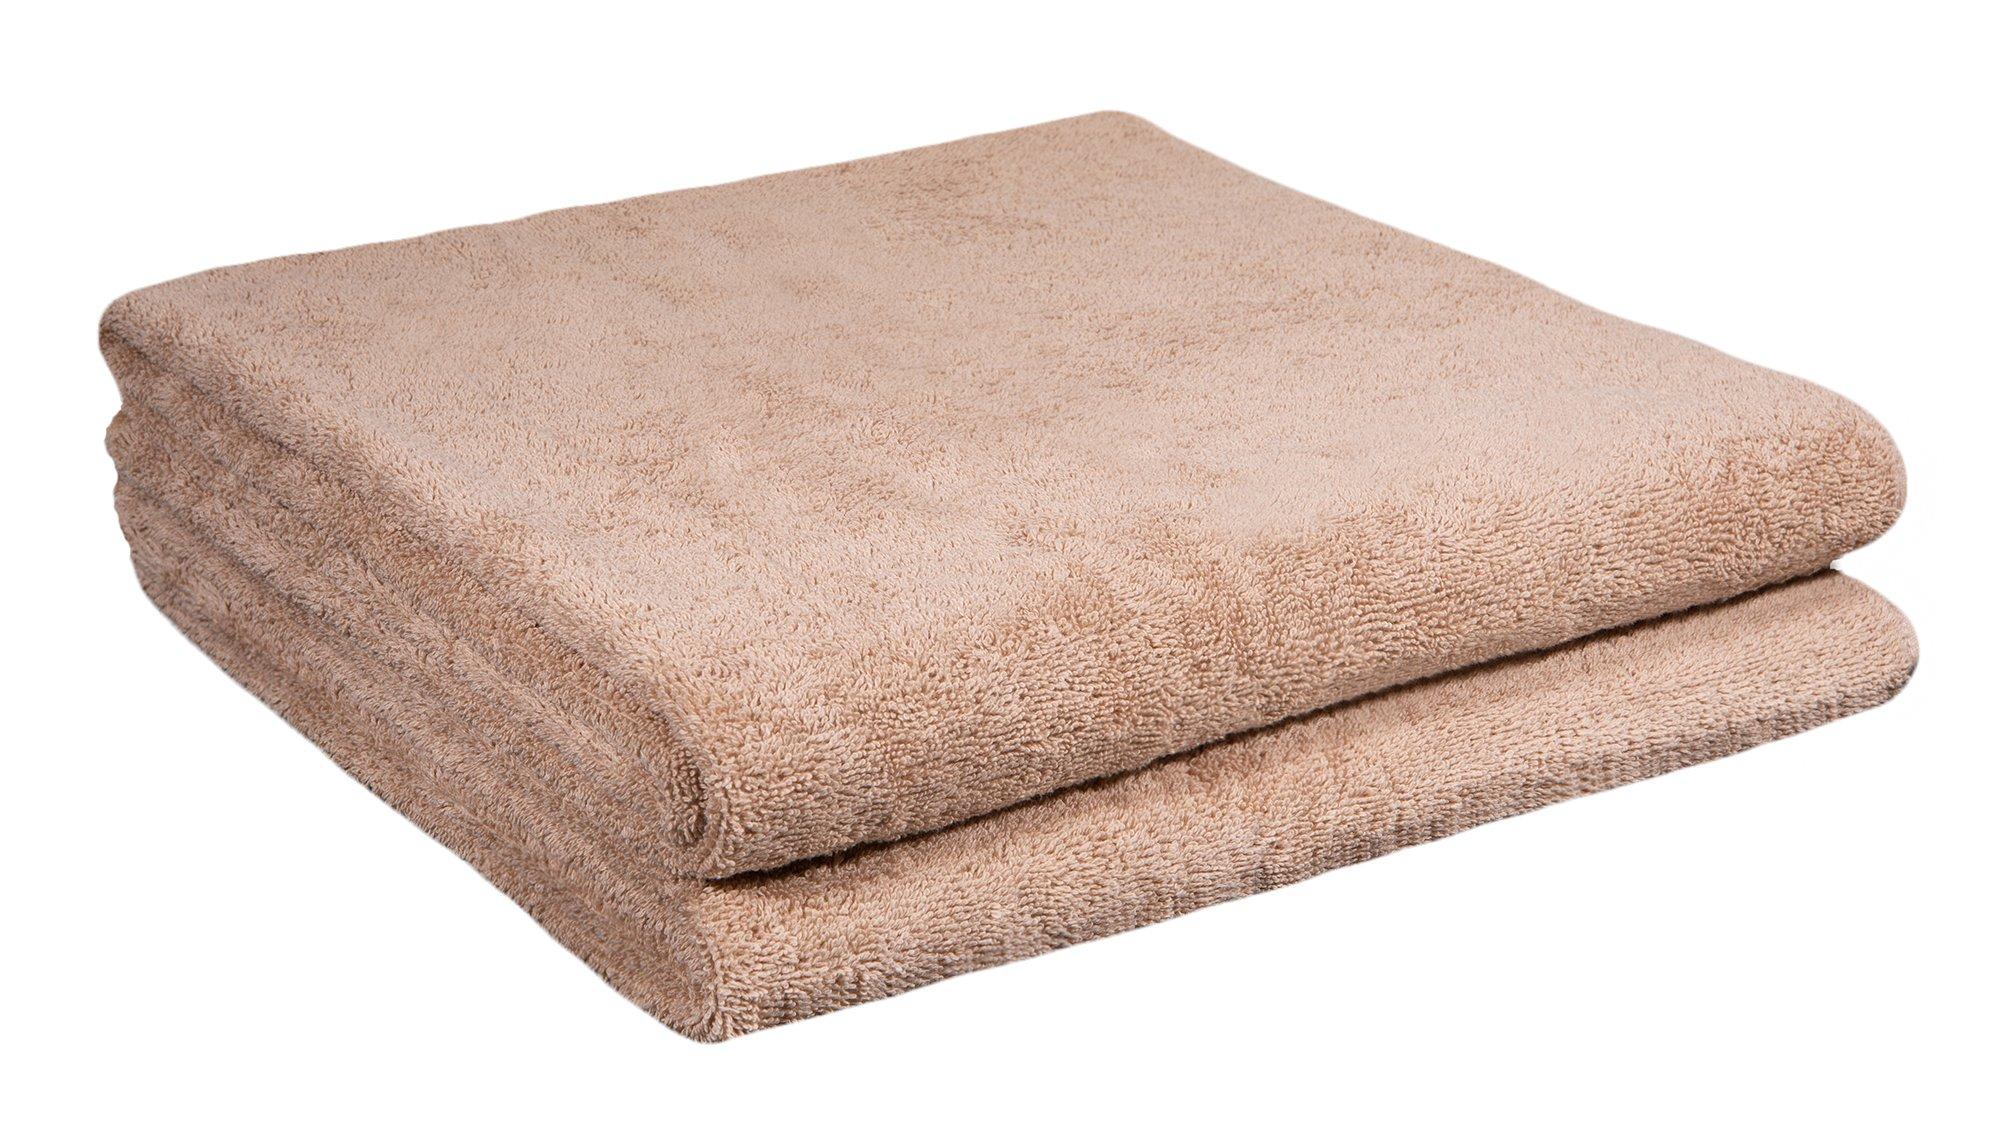 Home and Plan Quick Dry Premium 100% Turkish Cotton Bath Sheets | 2-Piece Set, Oversized Bath Towels (30x60) - Beige (S1)